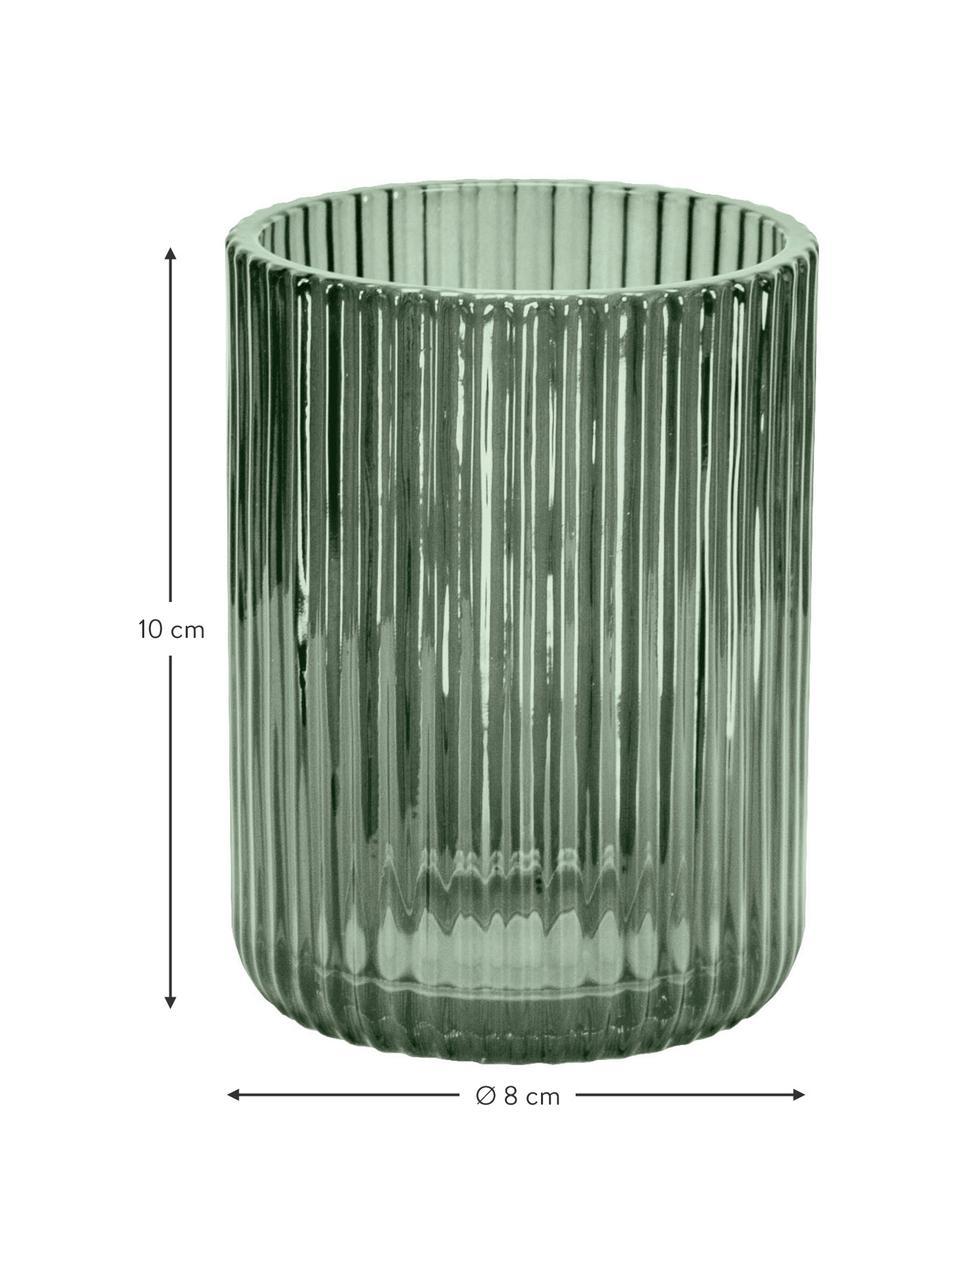 Zahnputzbecher Antoinette aus Glas, Glas, Olivgrün, Ø 8 x H 10 cm